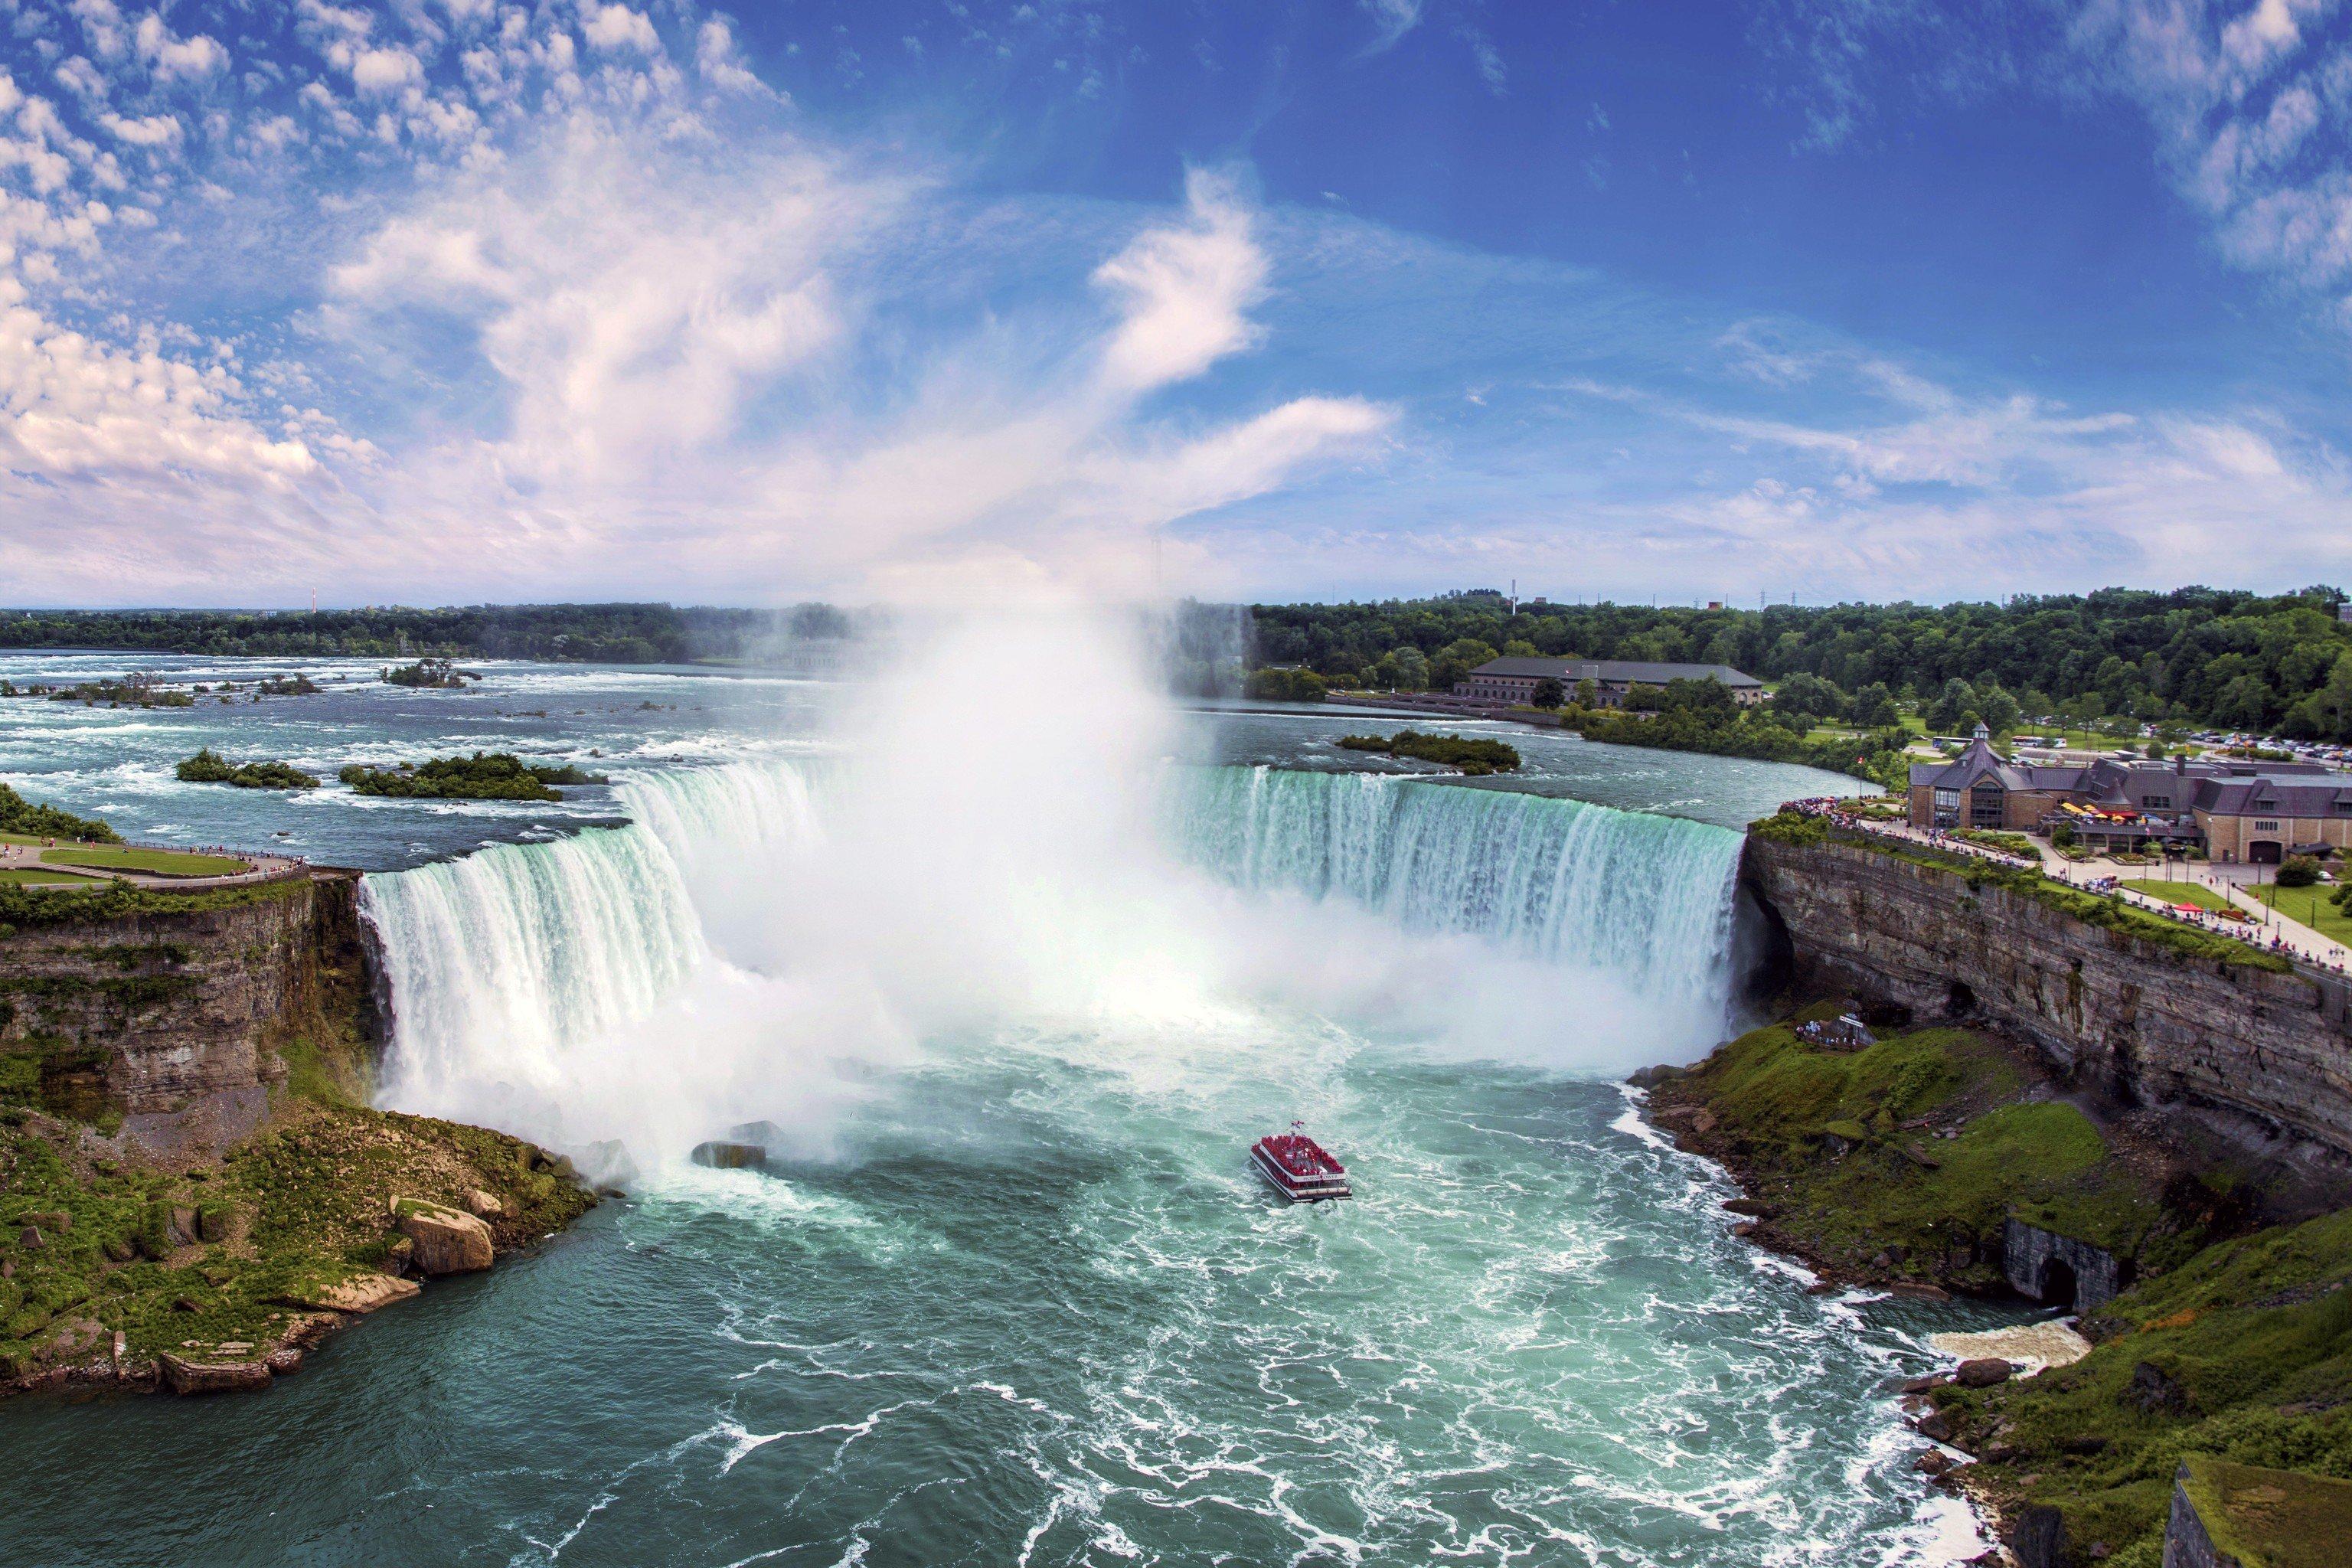 Hotels Trip Ideas Outdoor Water Sky Waterfall Body Of Nature Feature River Coast Sea 1 Marriott Niagara Falls